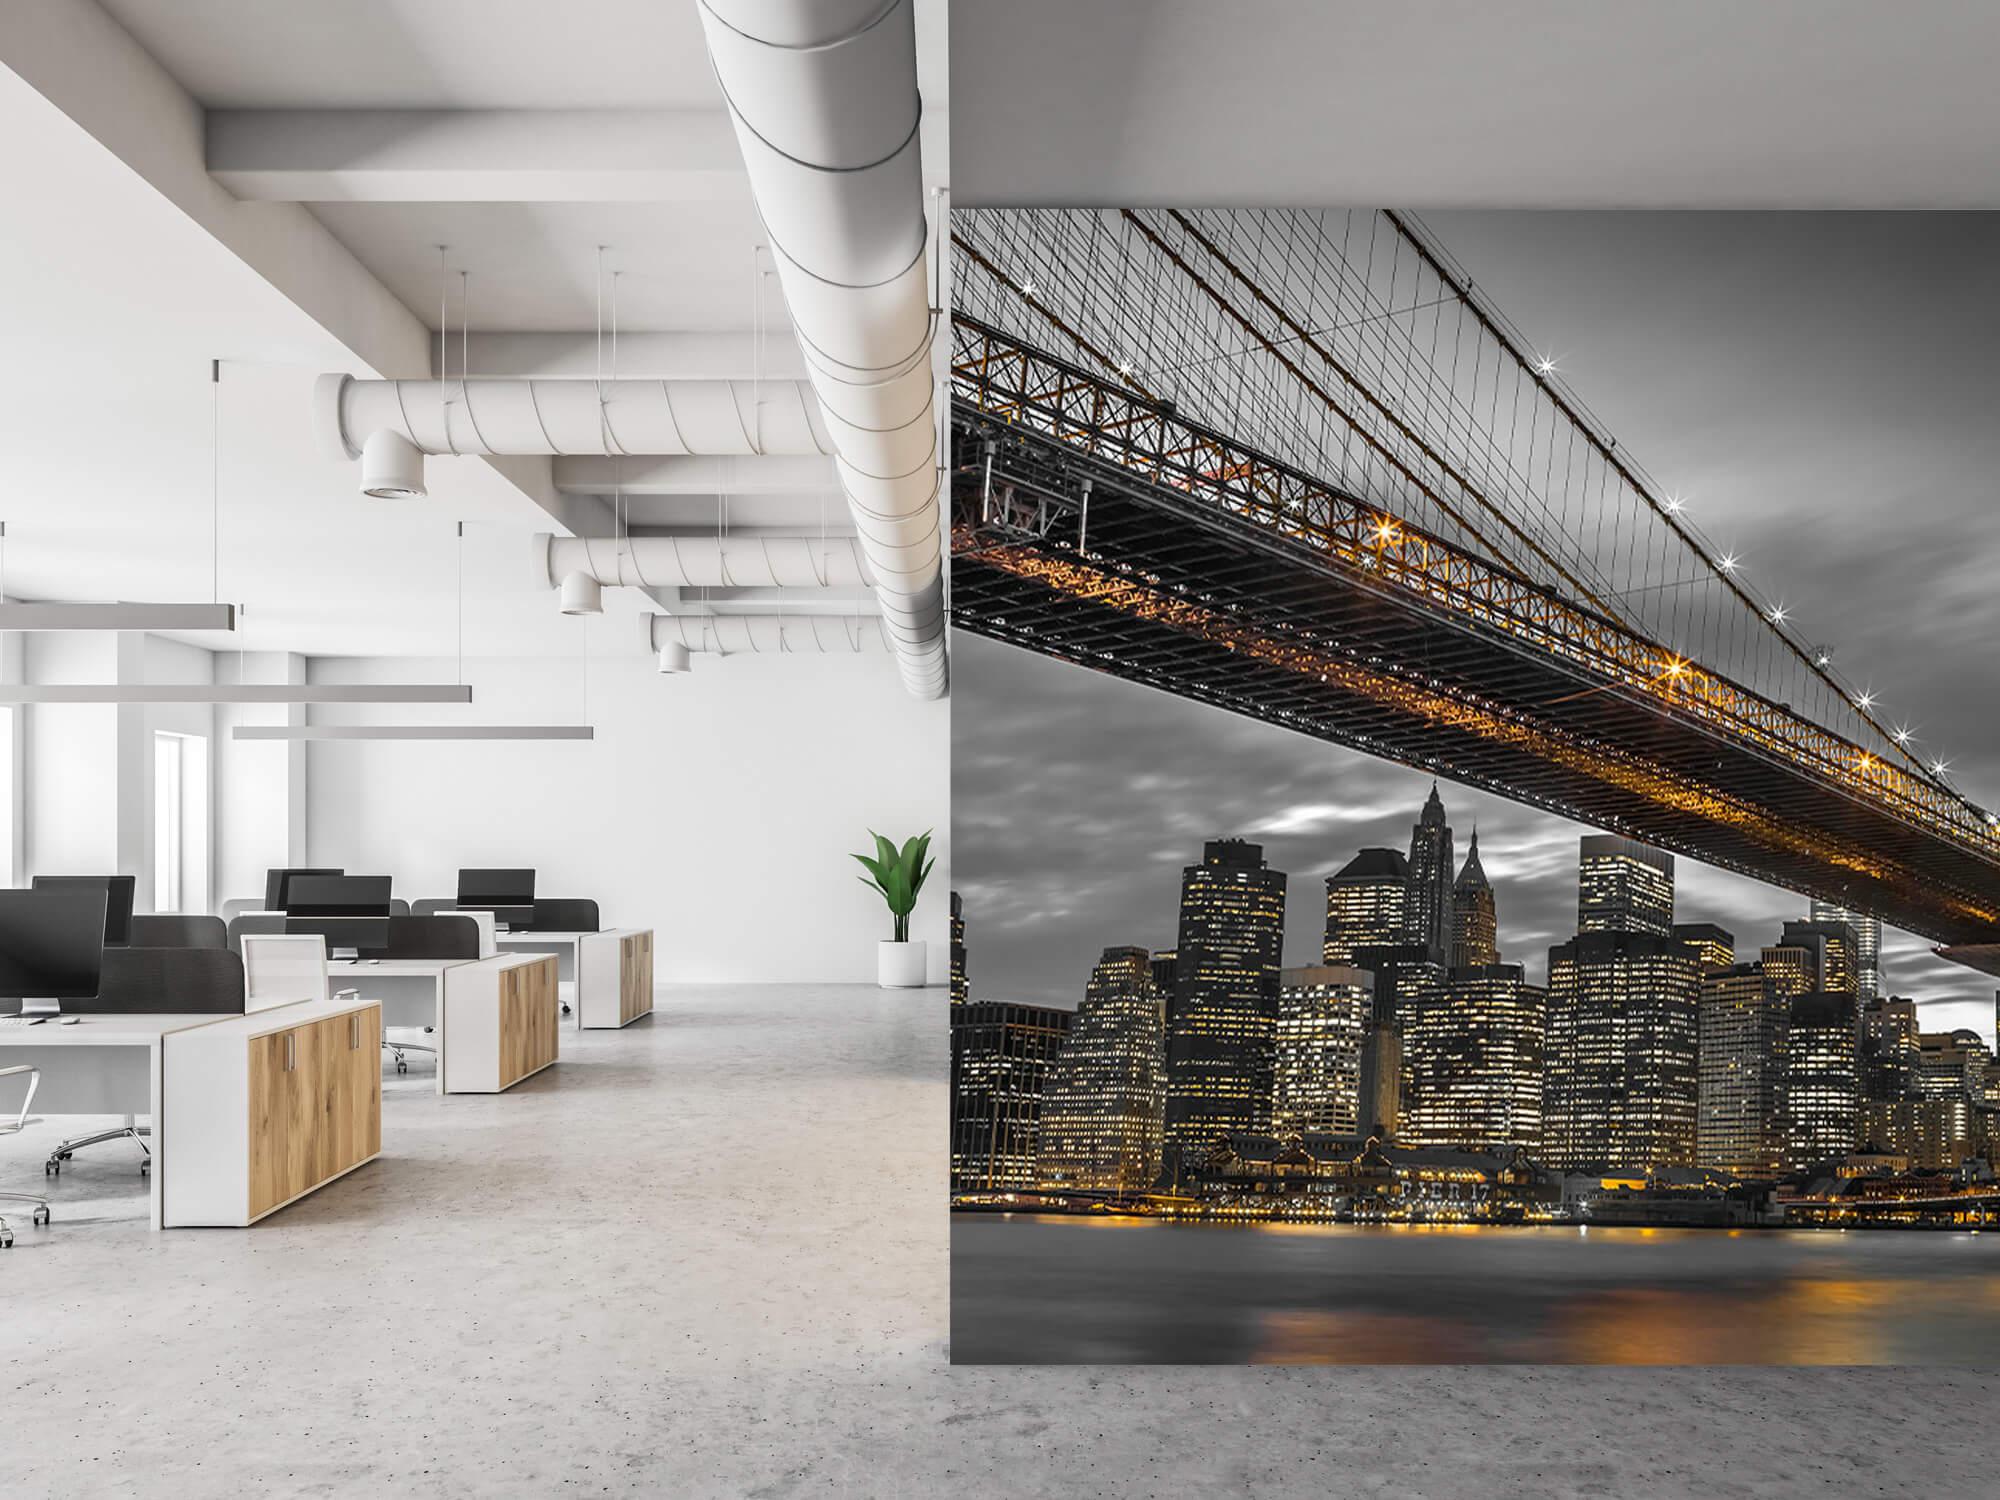 Brooklyn Bridge, New York 16